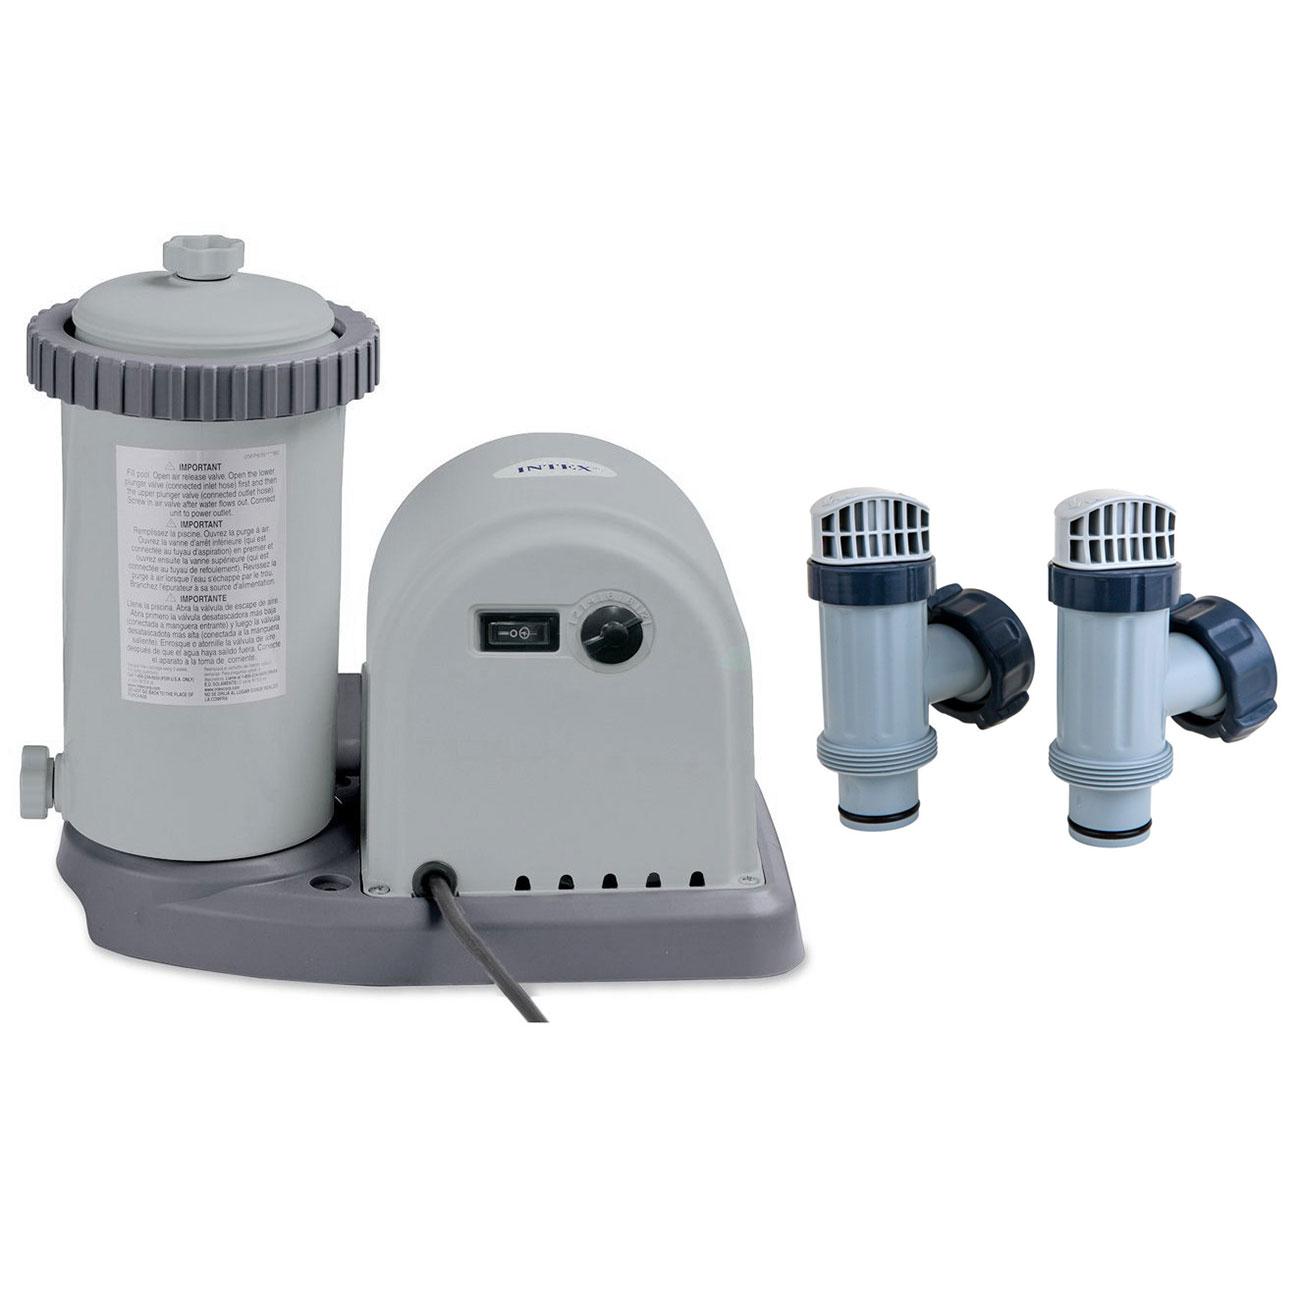 Intex 1500 Gph Pool Pump Amp Above Ground Pool Plunger Valve